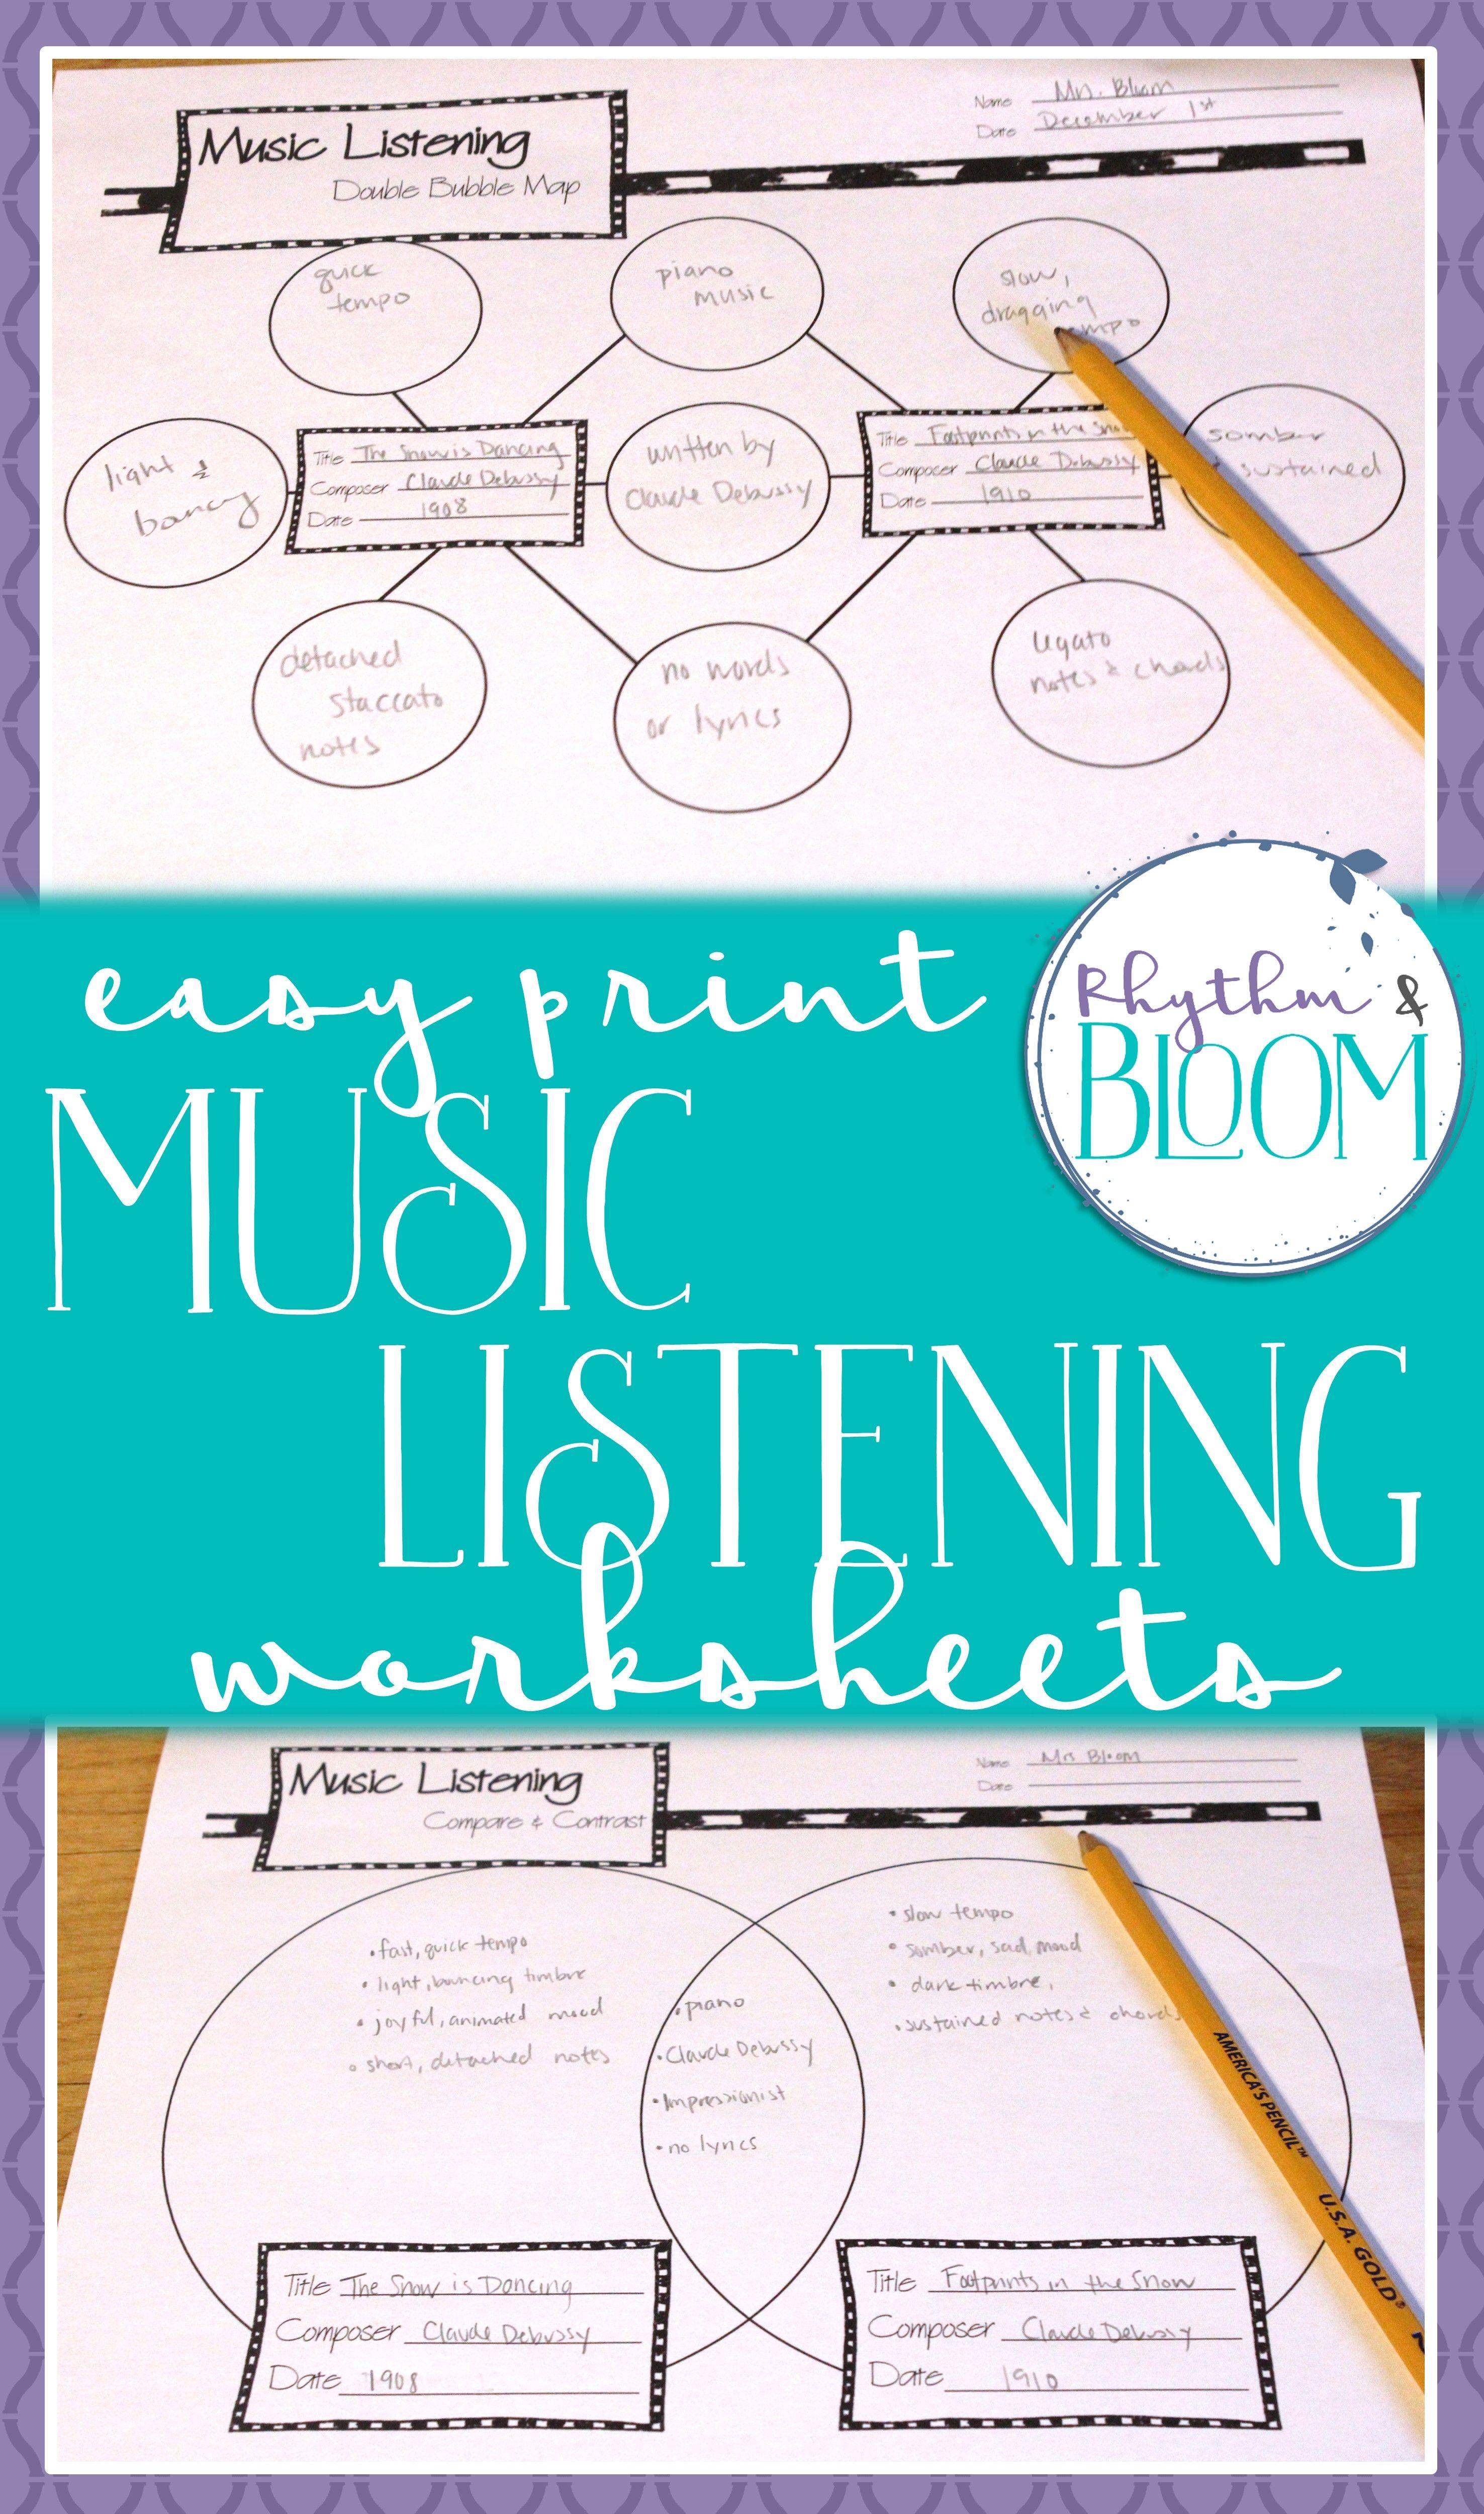 Music Listening Worksheet Bundle | Pinterest | Worksheets, Music ...